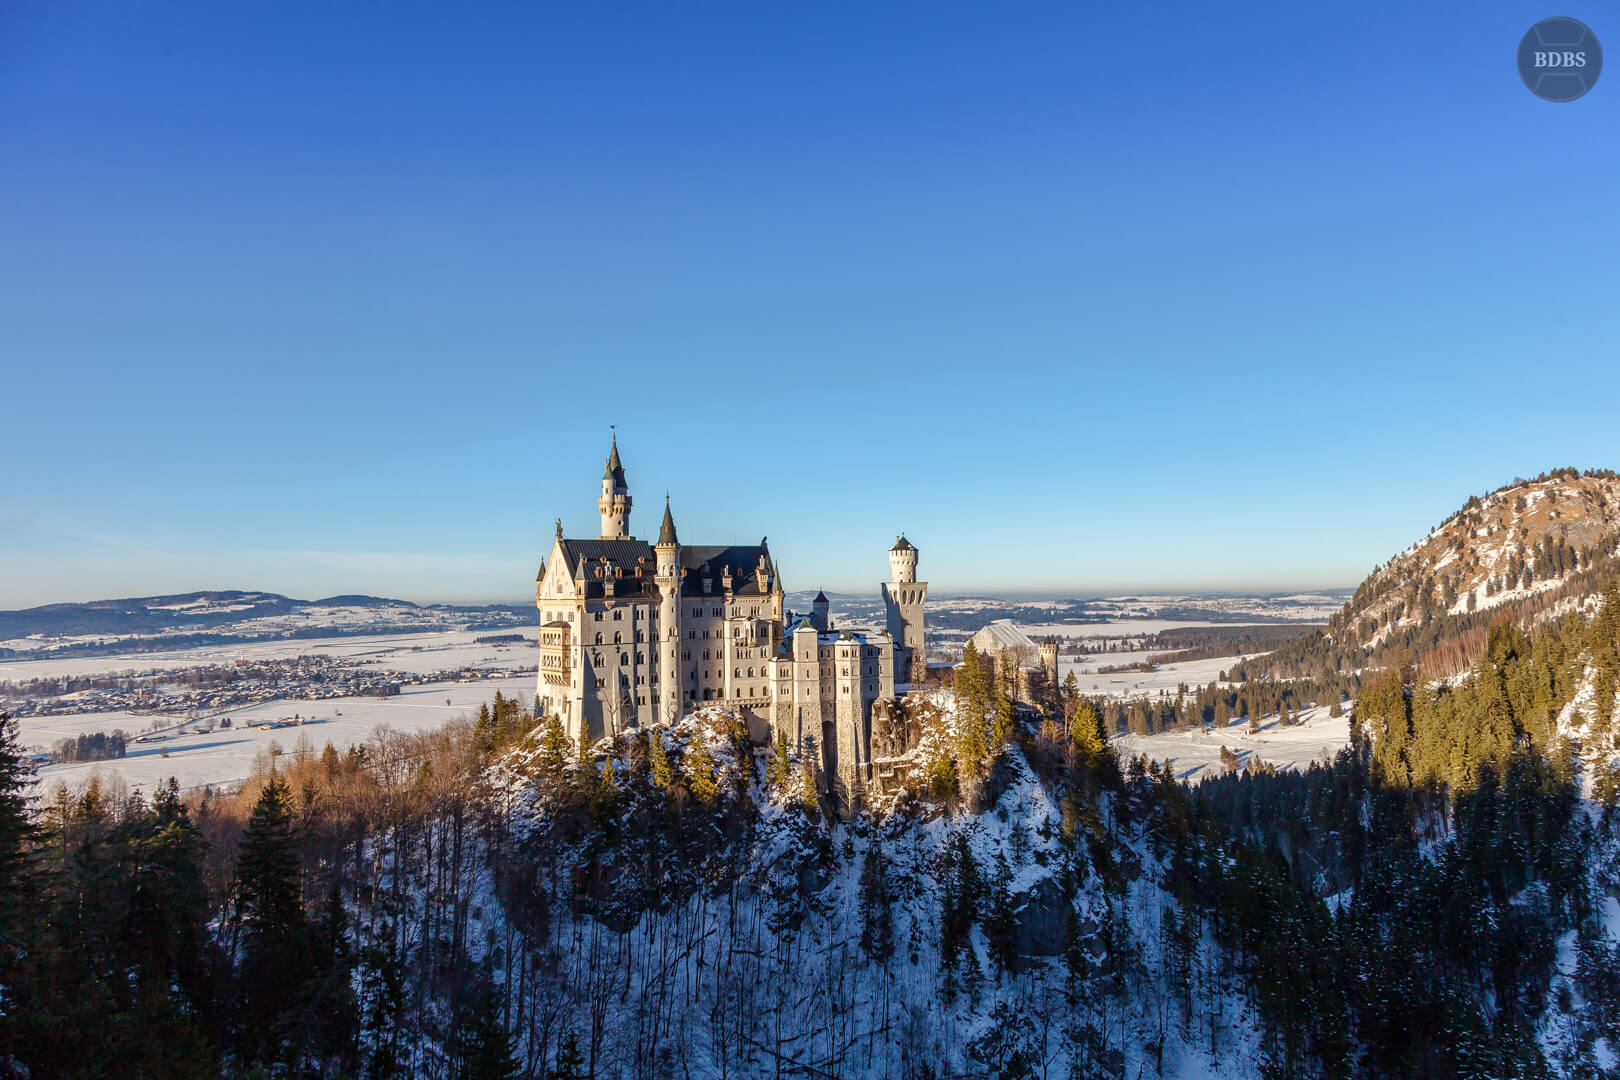 Schloss Neuschwanstein HDR ( 1/250 - f8,0 - 24mm - ISO100)